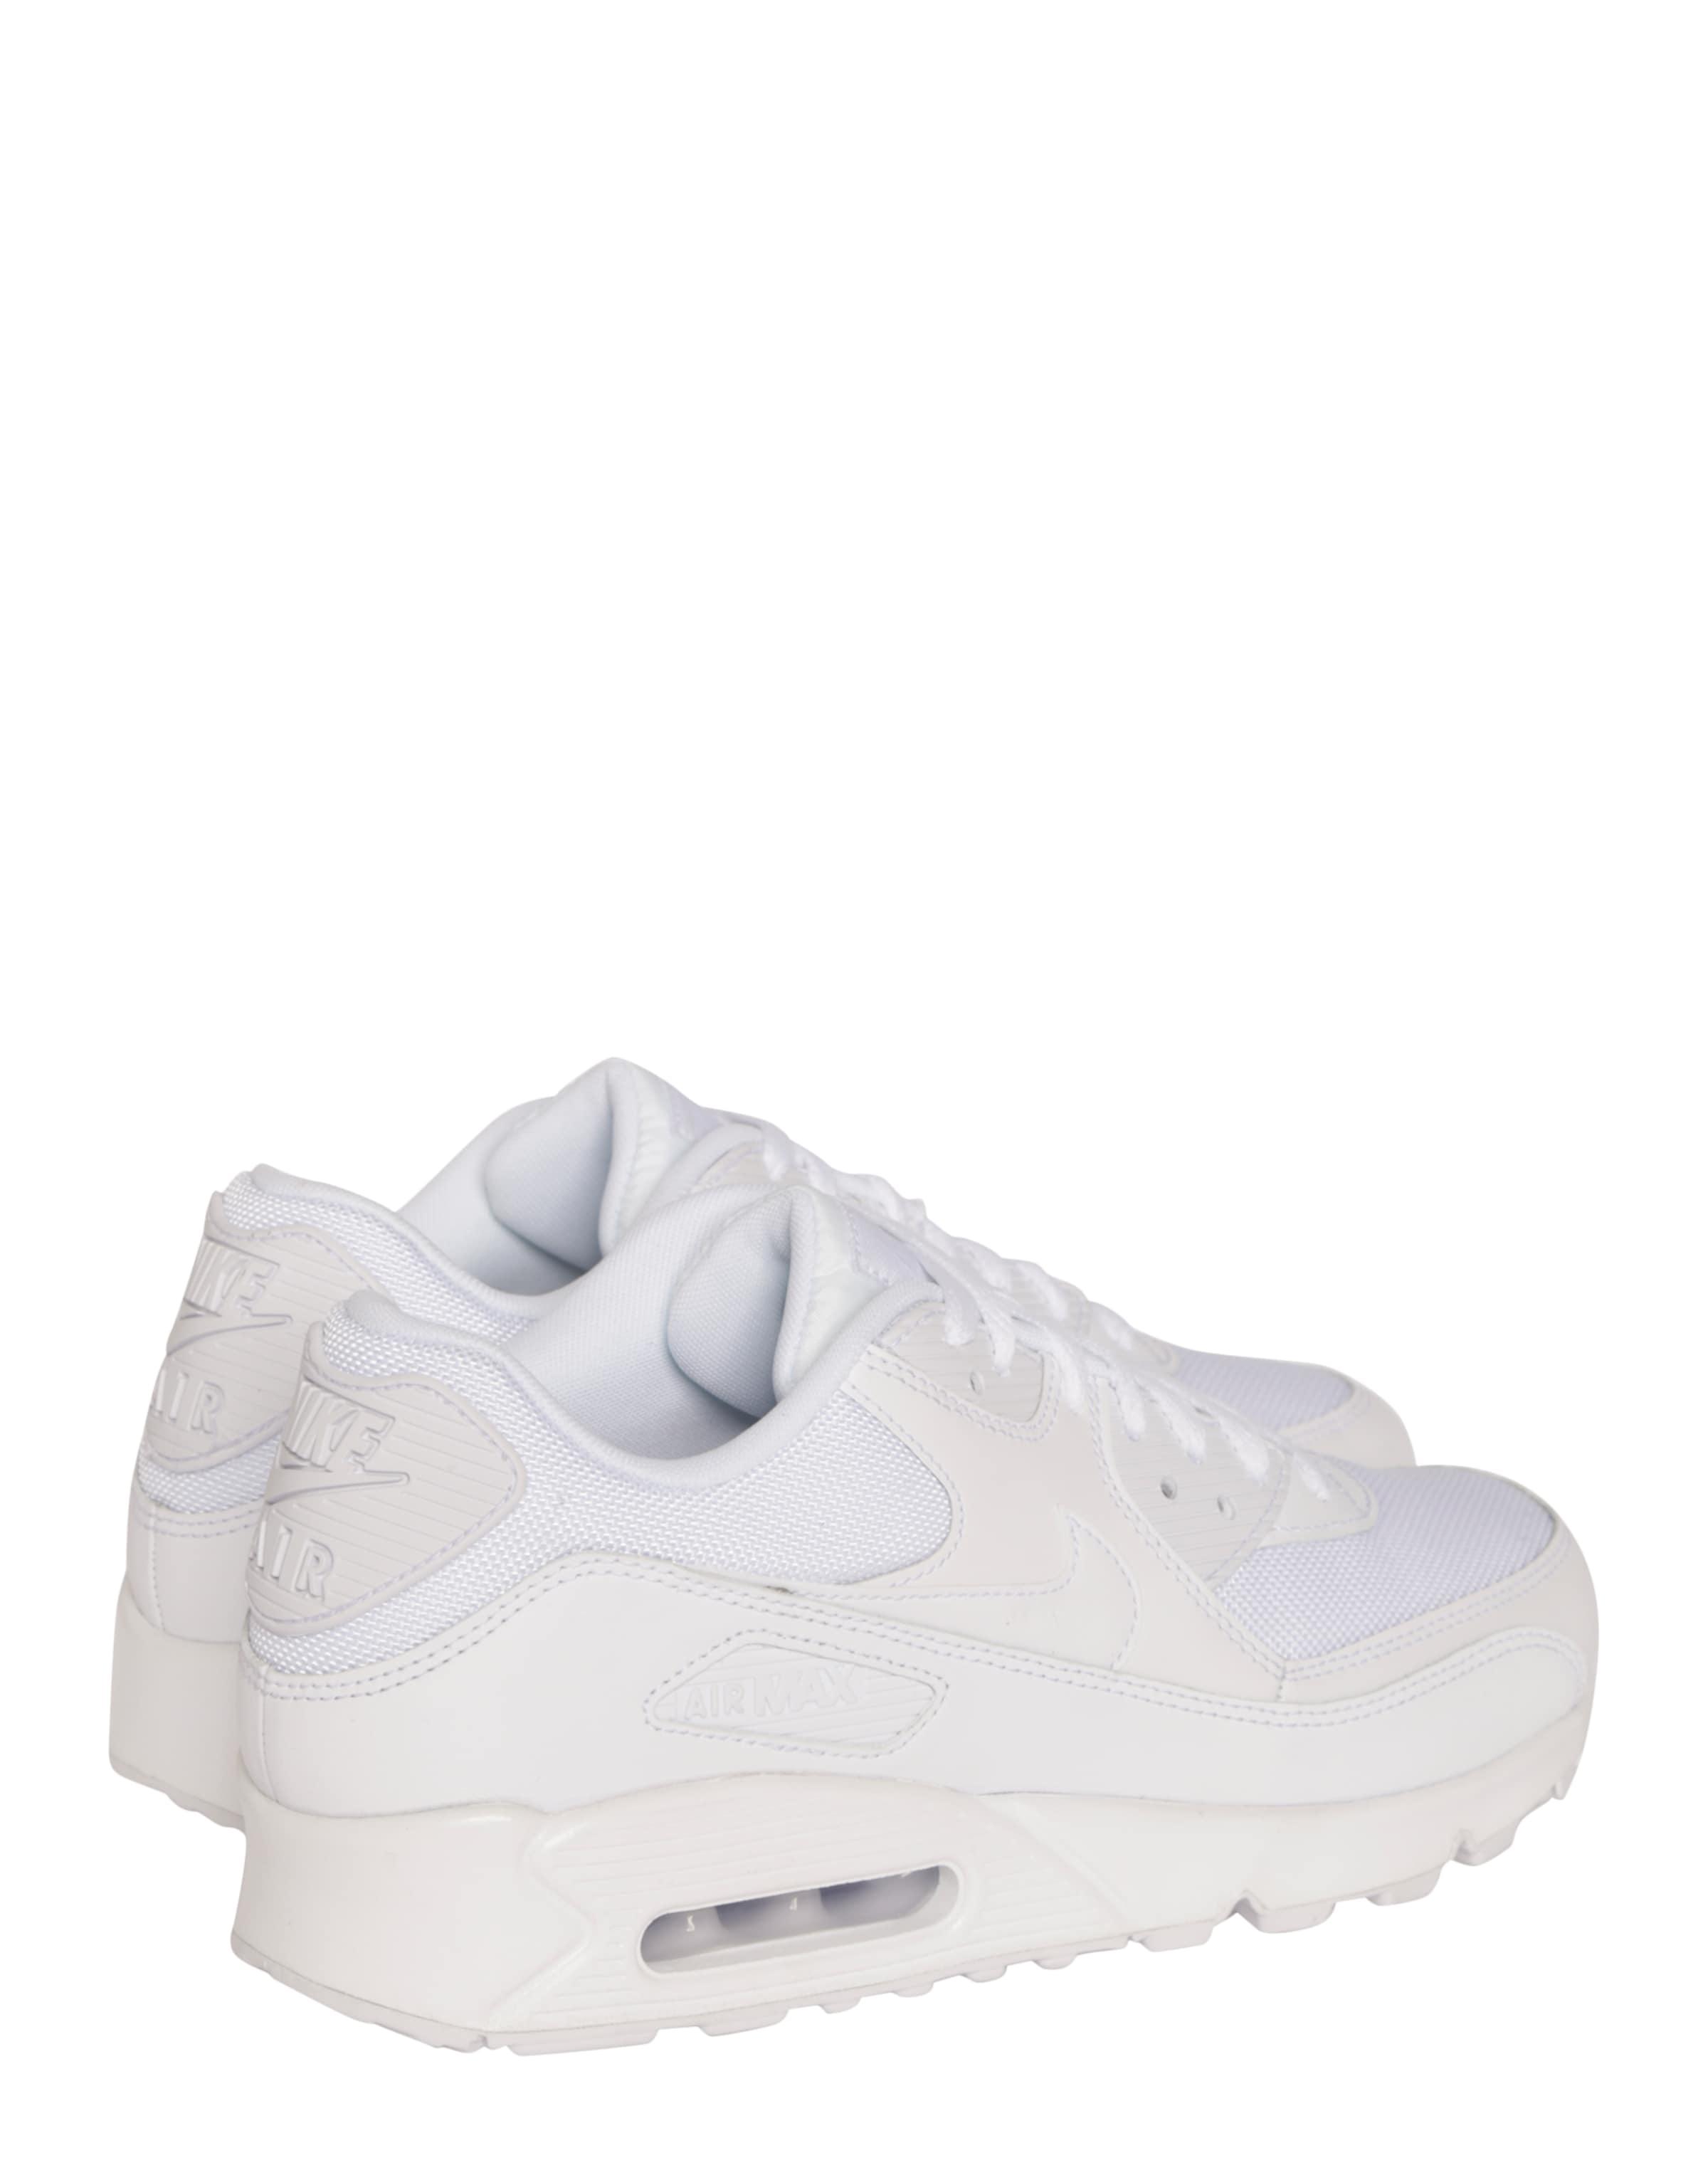 Weiß Nike Max Sportswear Sneaker Essential' In 90 'air wPXZTluOik